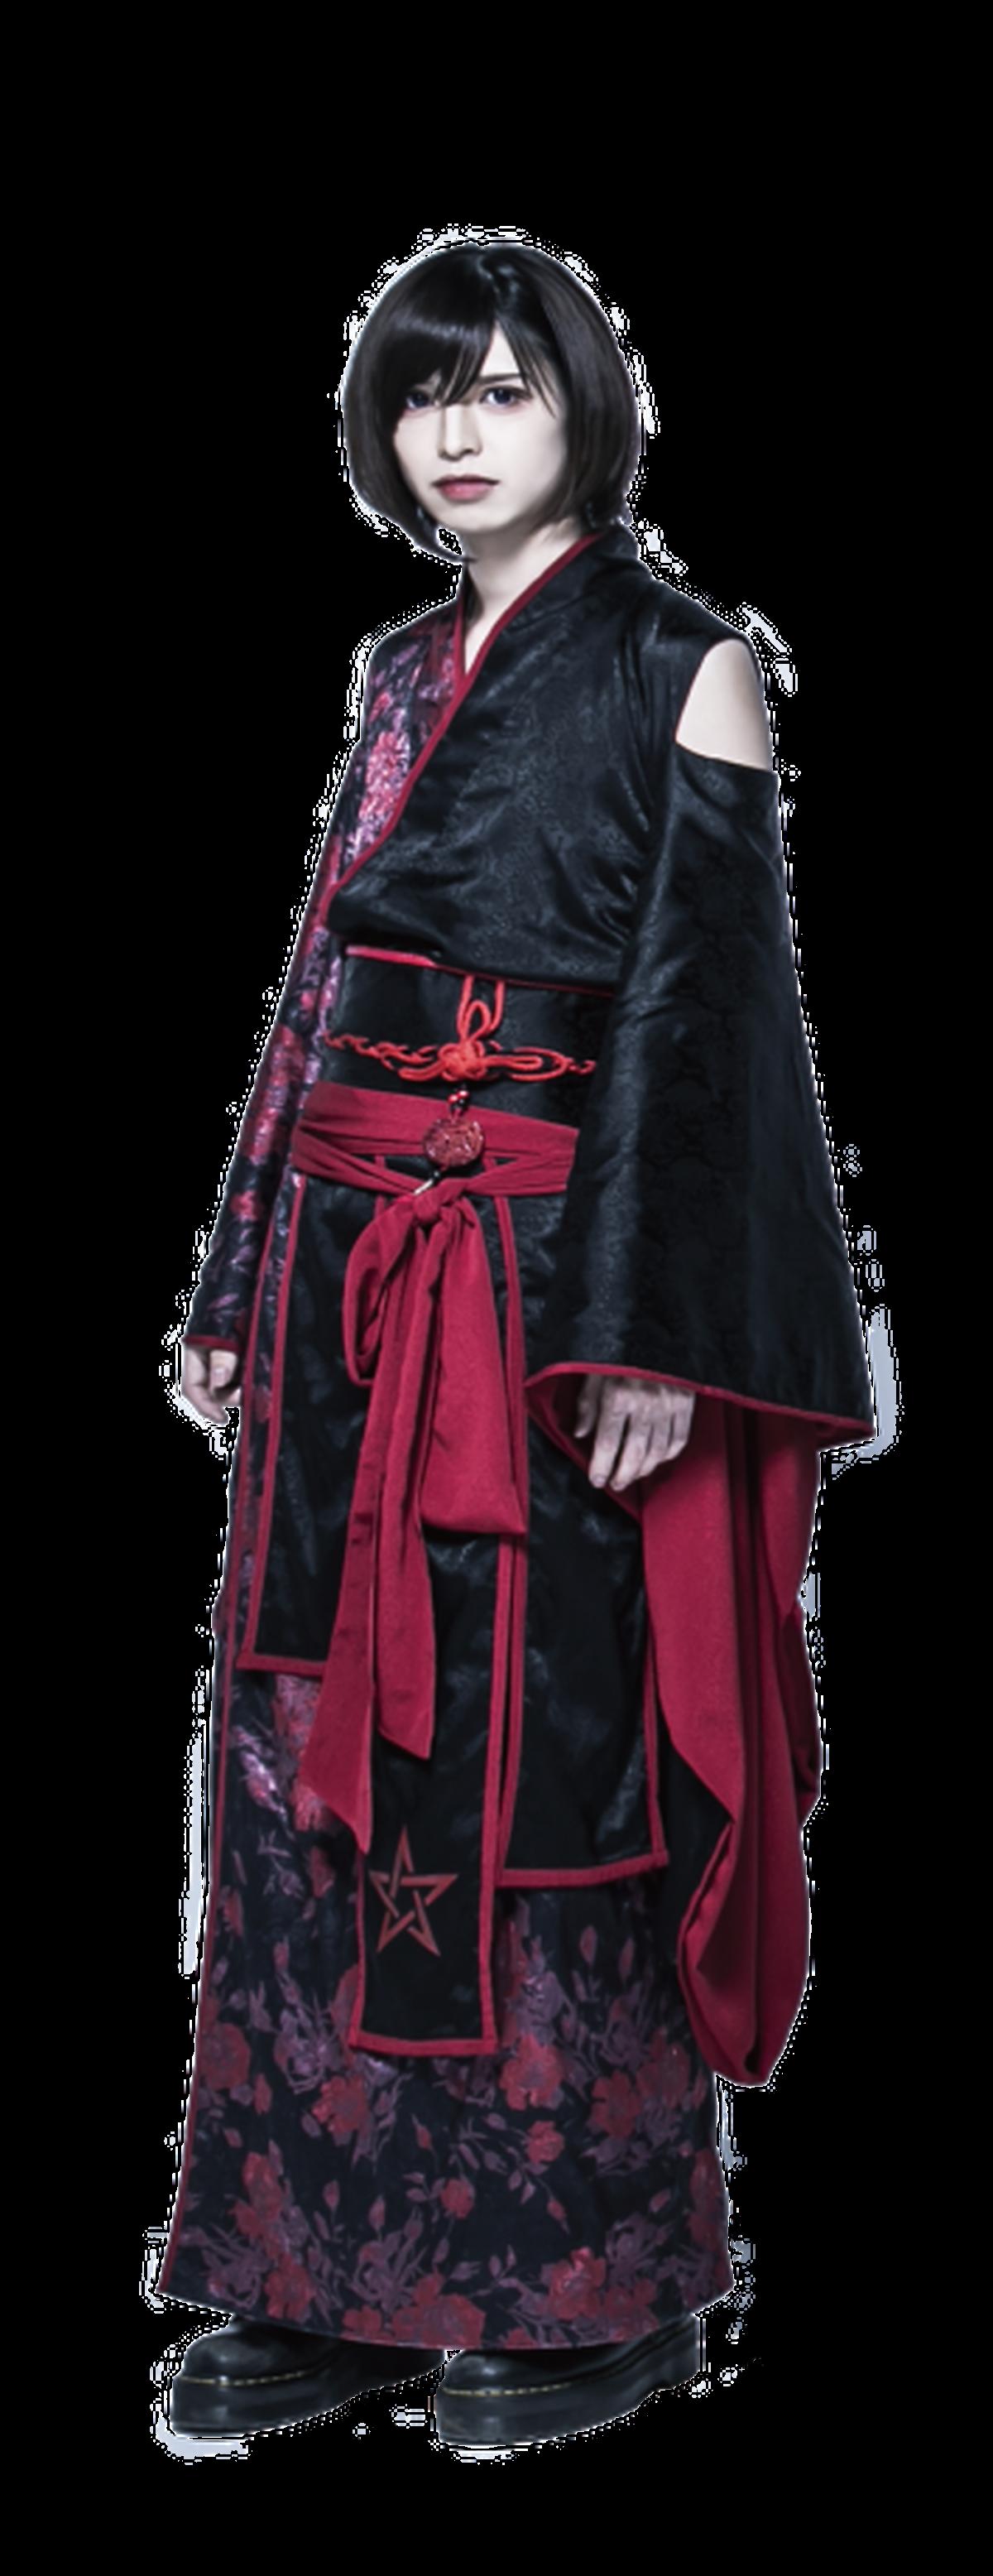 龍 矢 ジグザグ